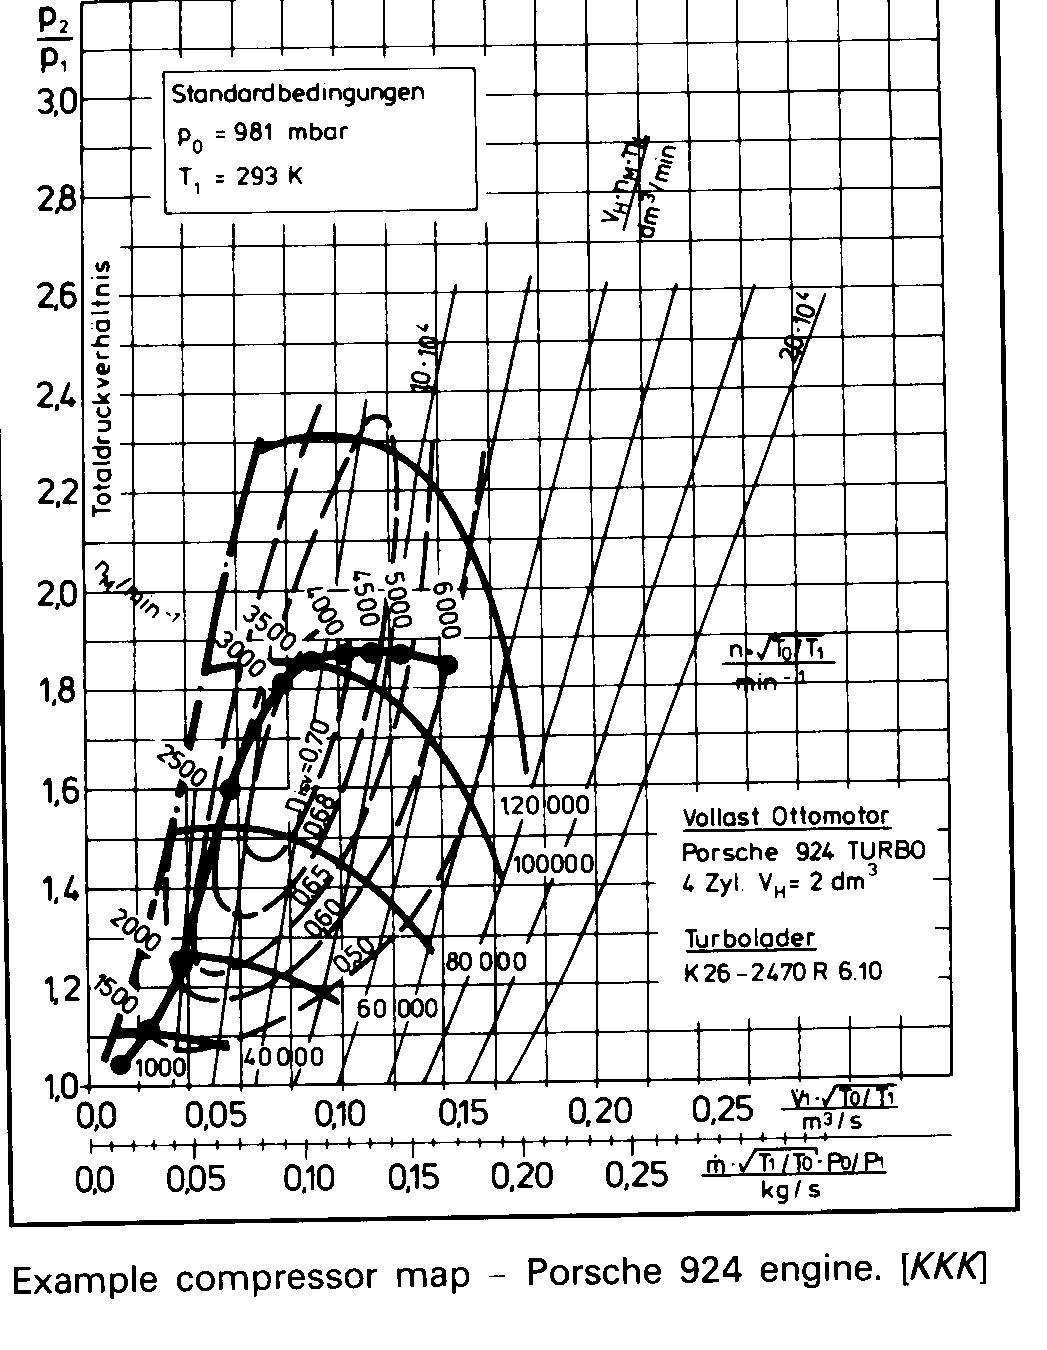 K26 Turbo Flow Compressor Map